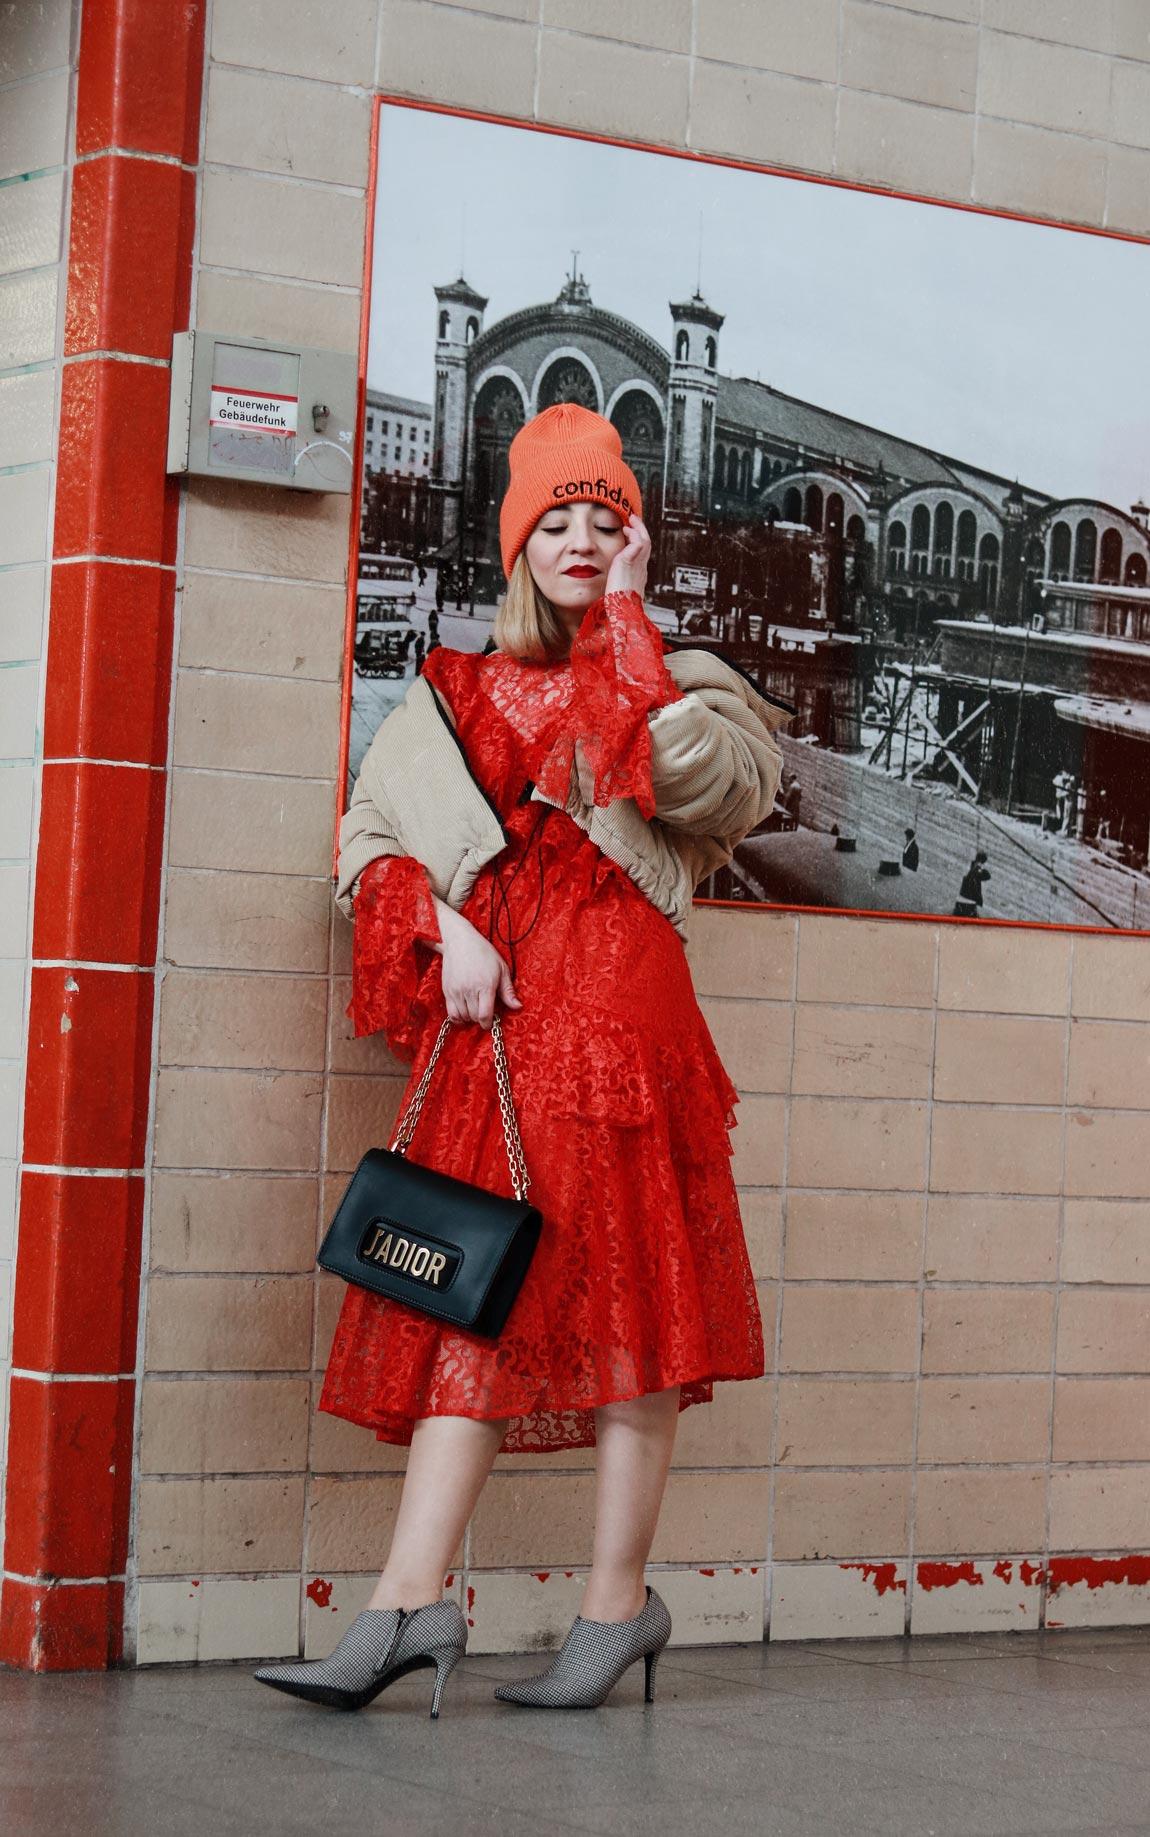 spitzen, kleid, fashionblogger, modeblogger, berlin, mode, fashion, blog, style, streetstyle, bahn, spitze, asos, asseenonme, rot, stilbruch, inspiration, ootd